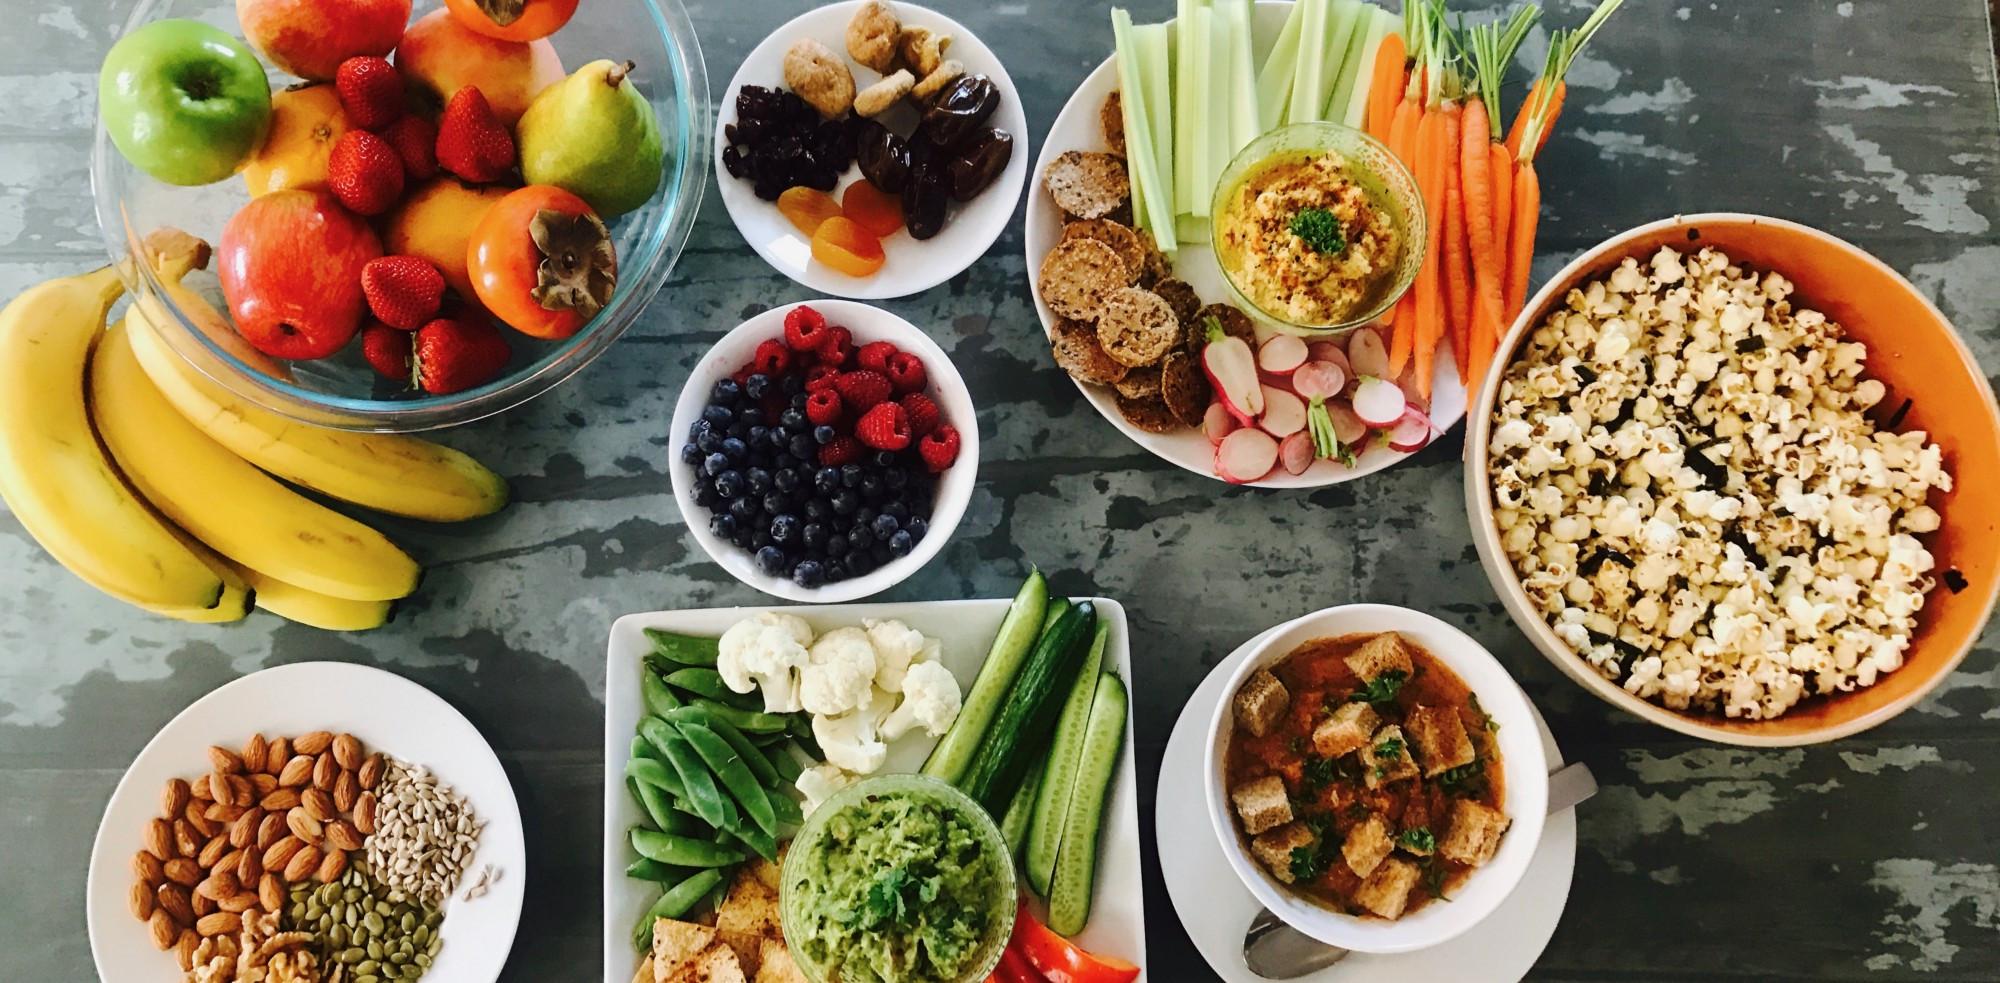 Healthy Snacks That Taste Good  5 Ways to Make Healthy Food That Actually Tastes GOOD